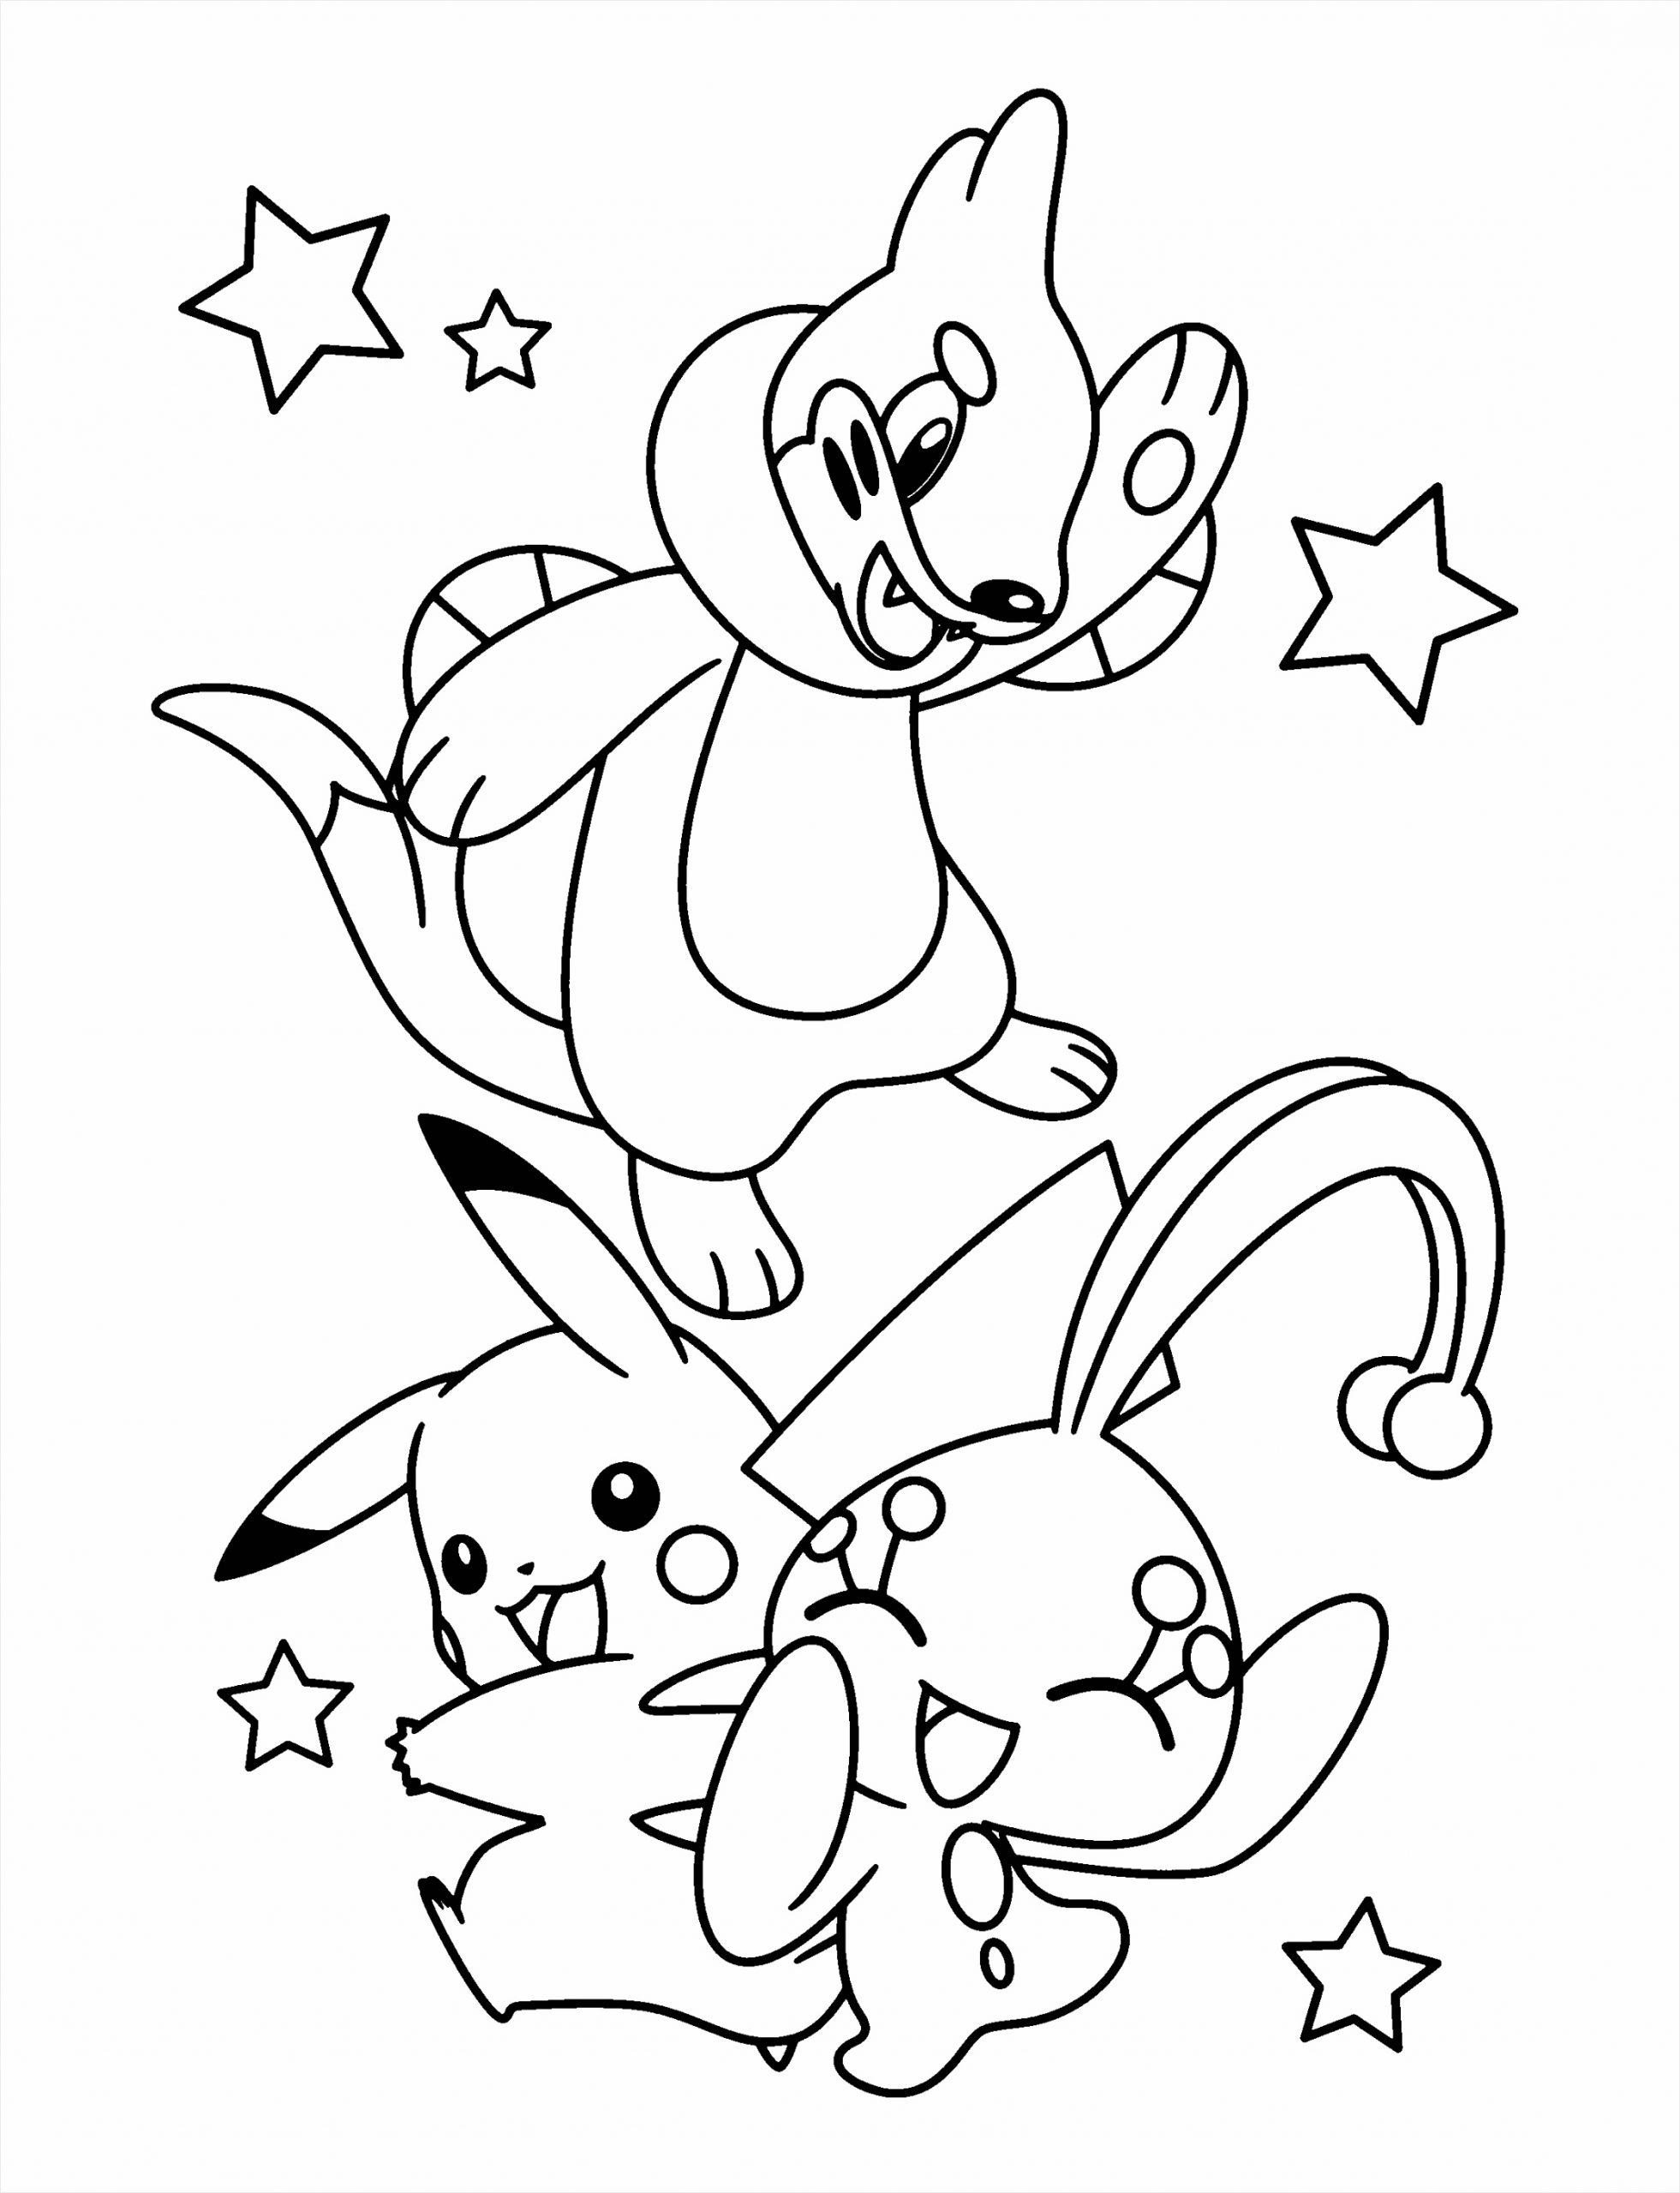 kleurplaten pokemon black and white n=3 uiwao